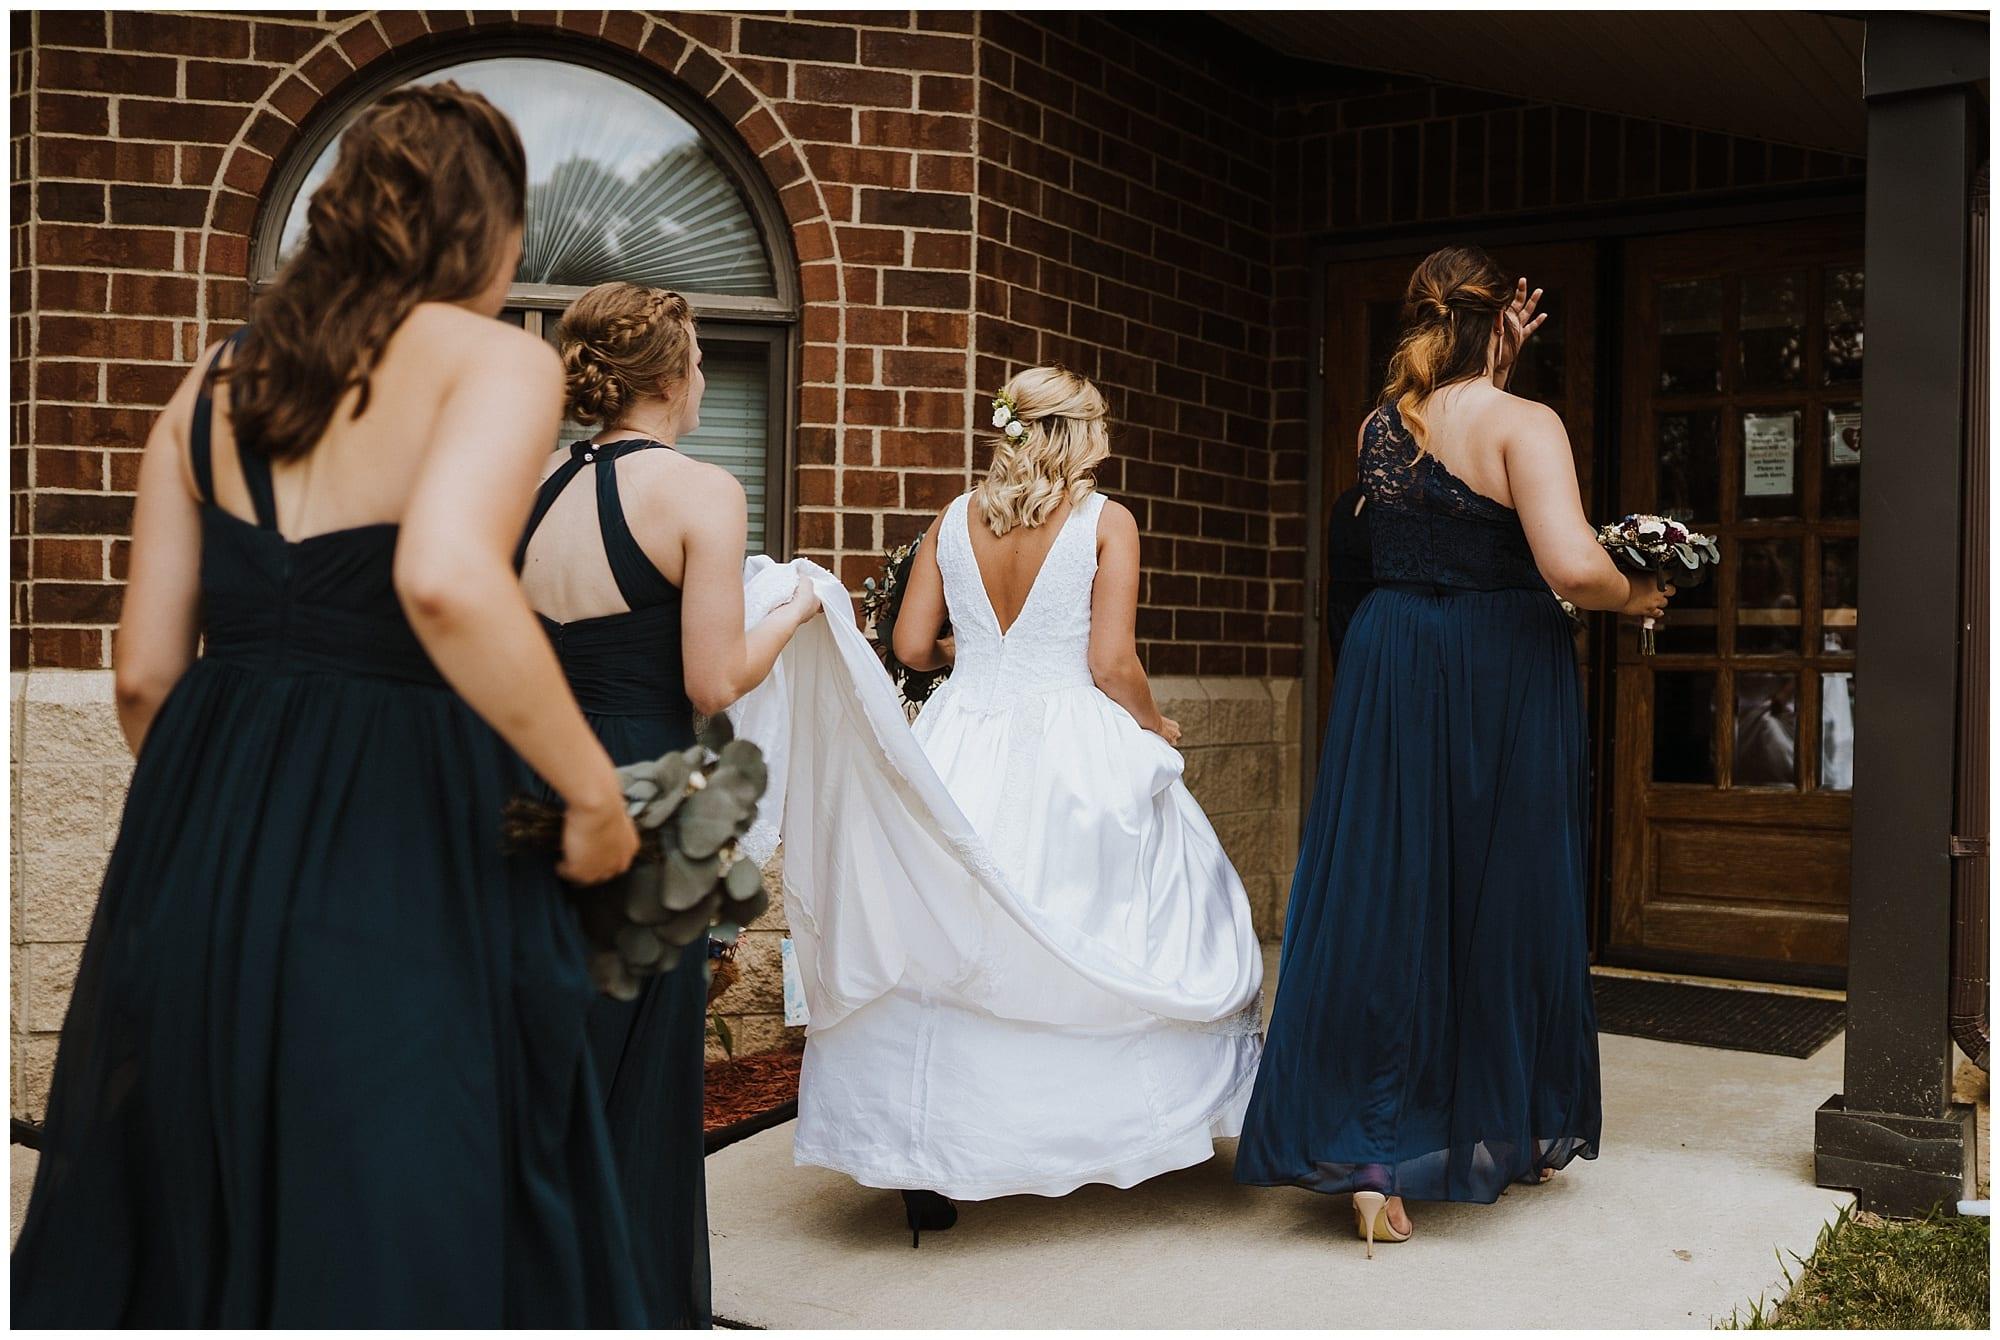 Adrian Michigan Wedding Photographer-57.JPG